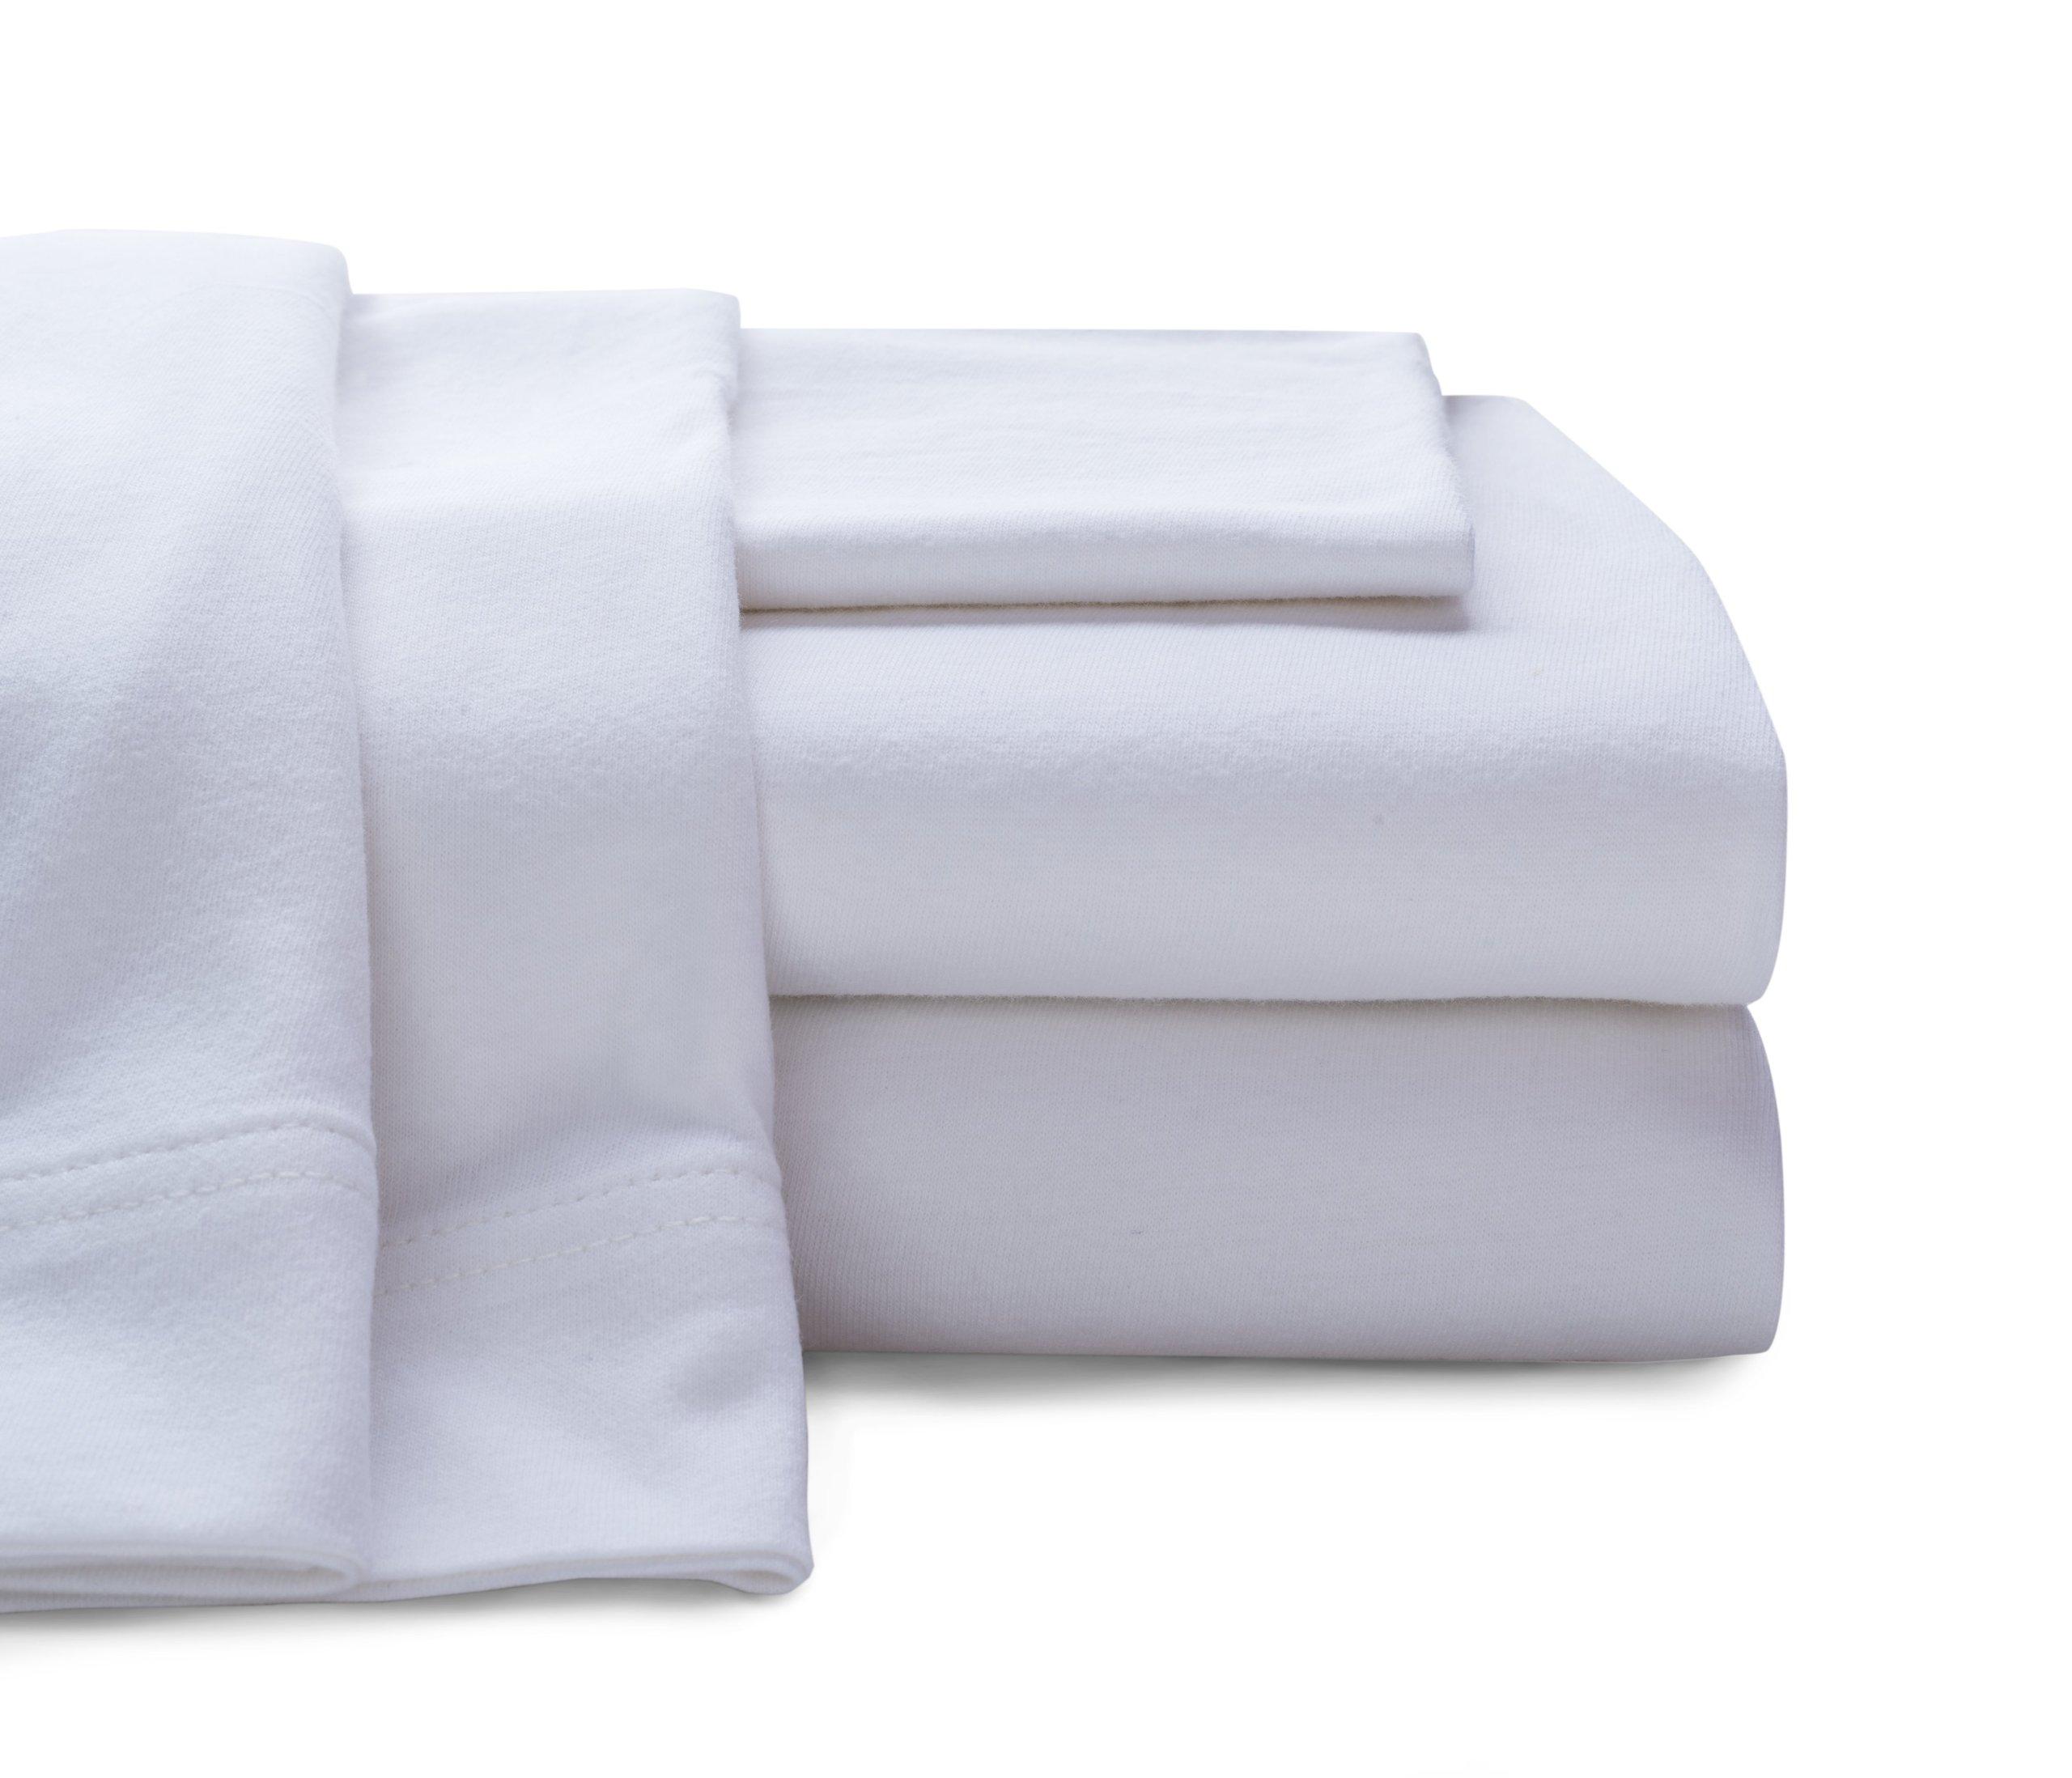 100 Percent Cotton Jersey Luxury 140 Gsm Quality Super